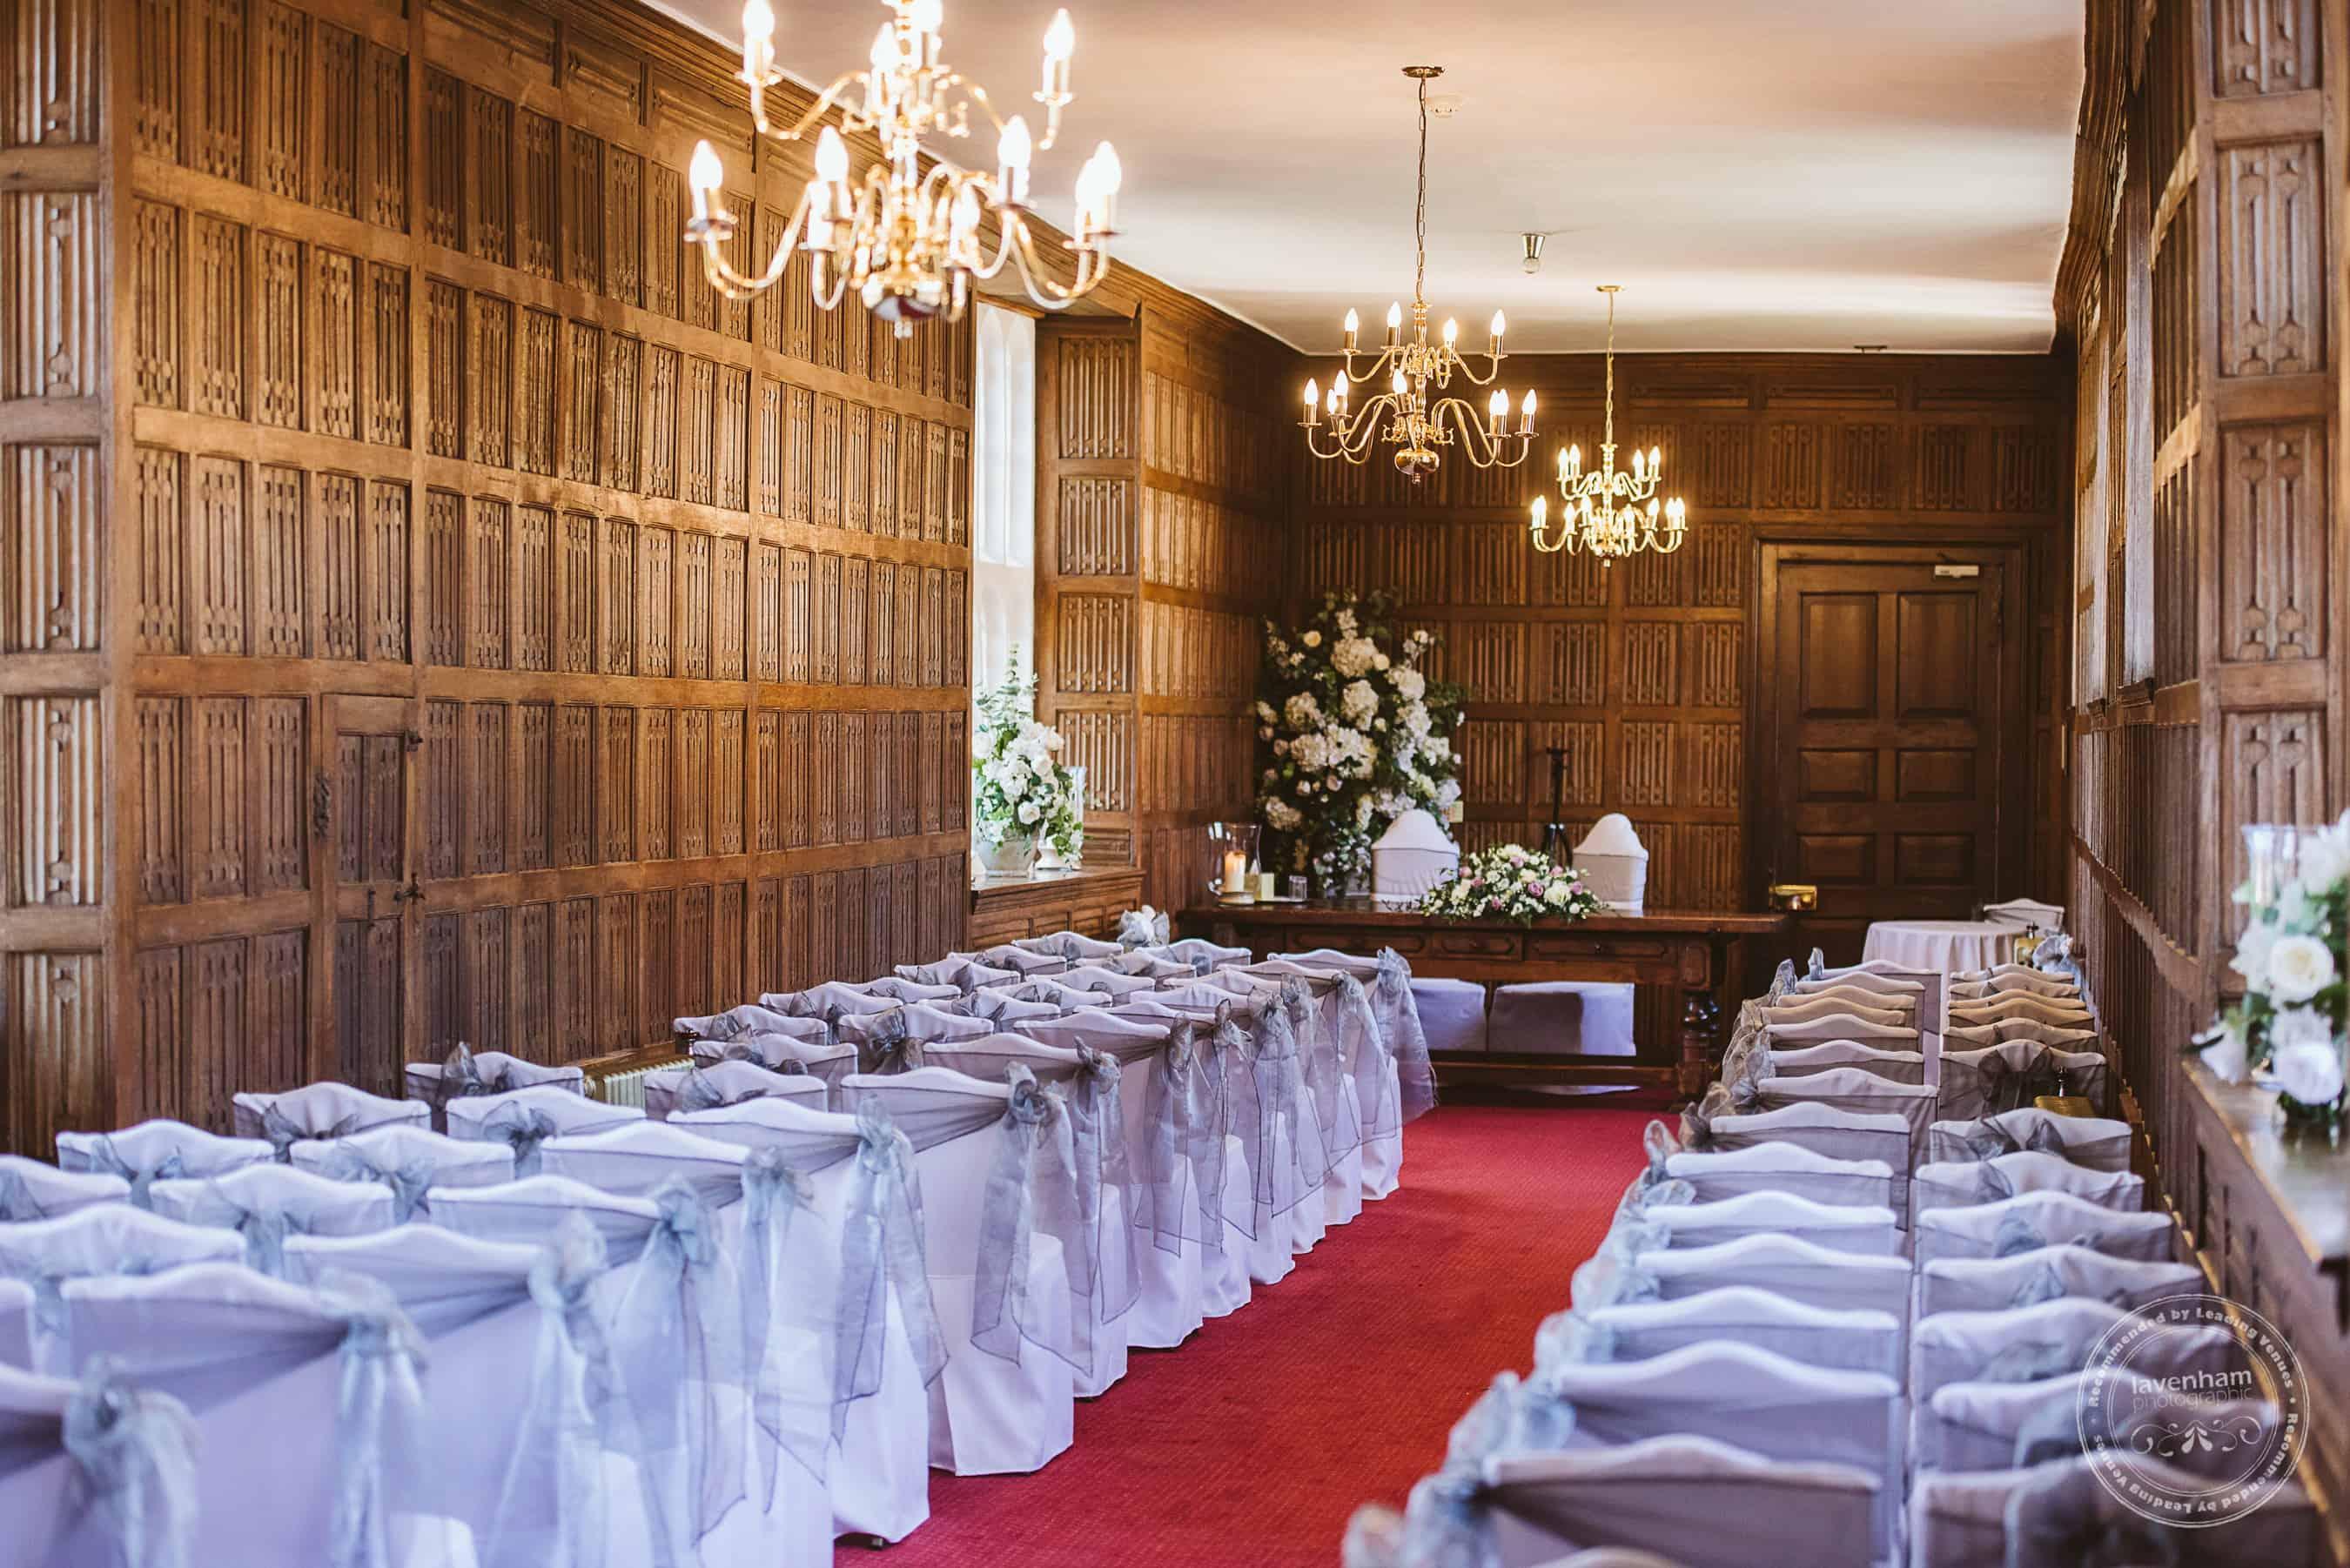 281018 Gosfield Hall Wedding Photography Lavenham Photographic 007